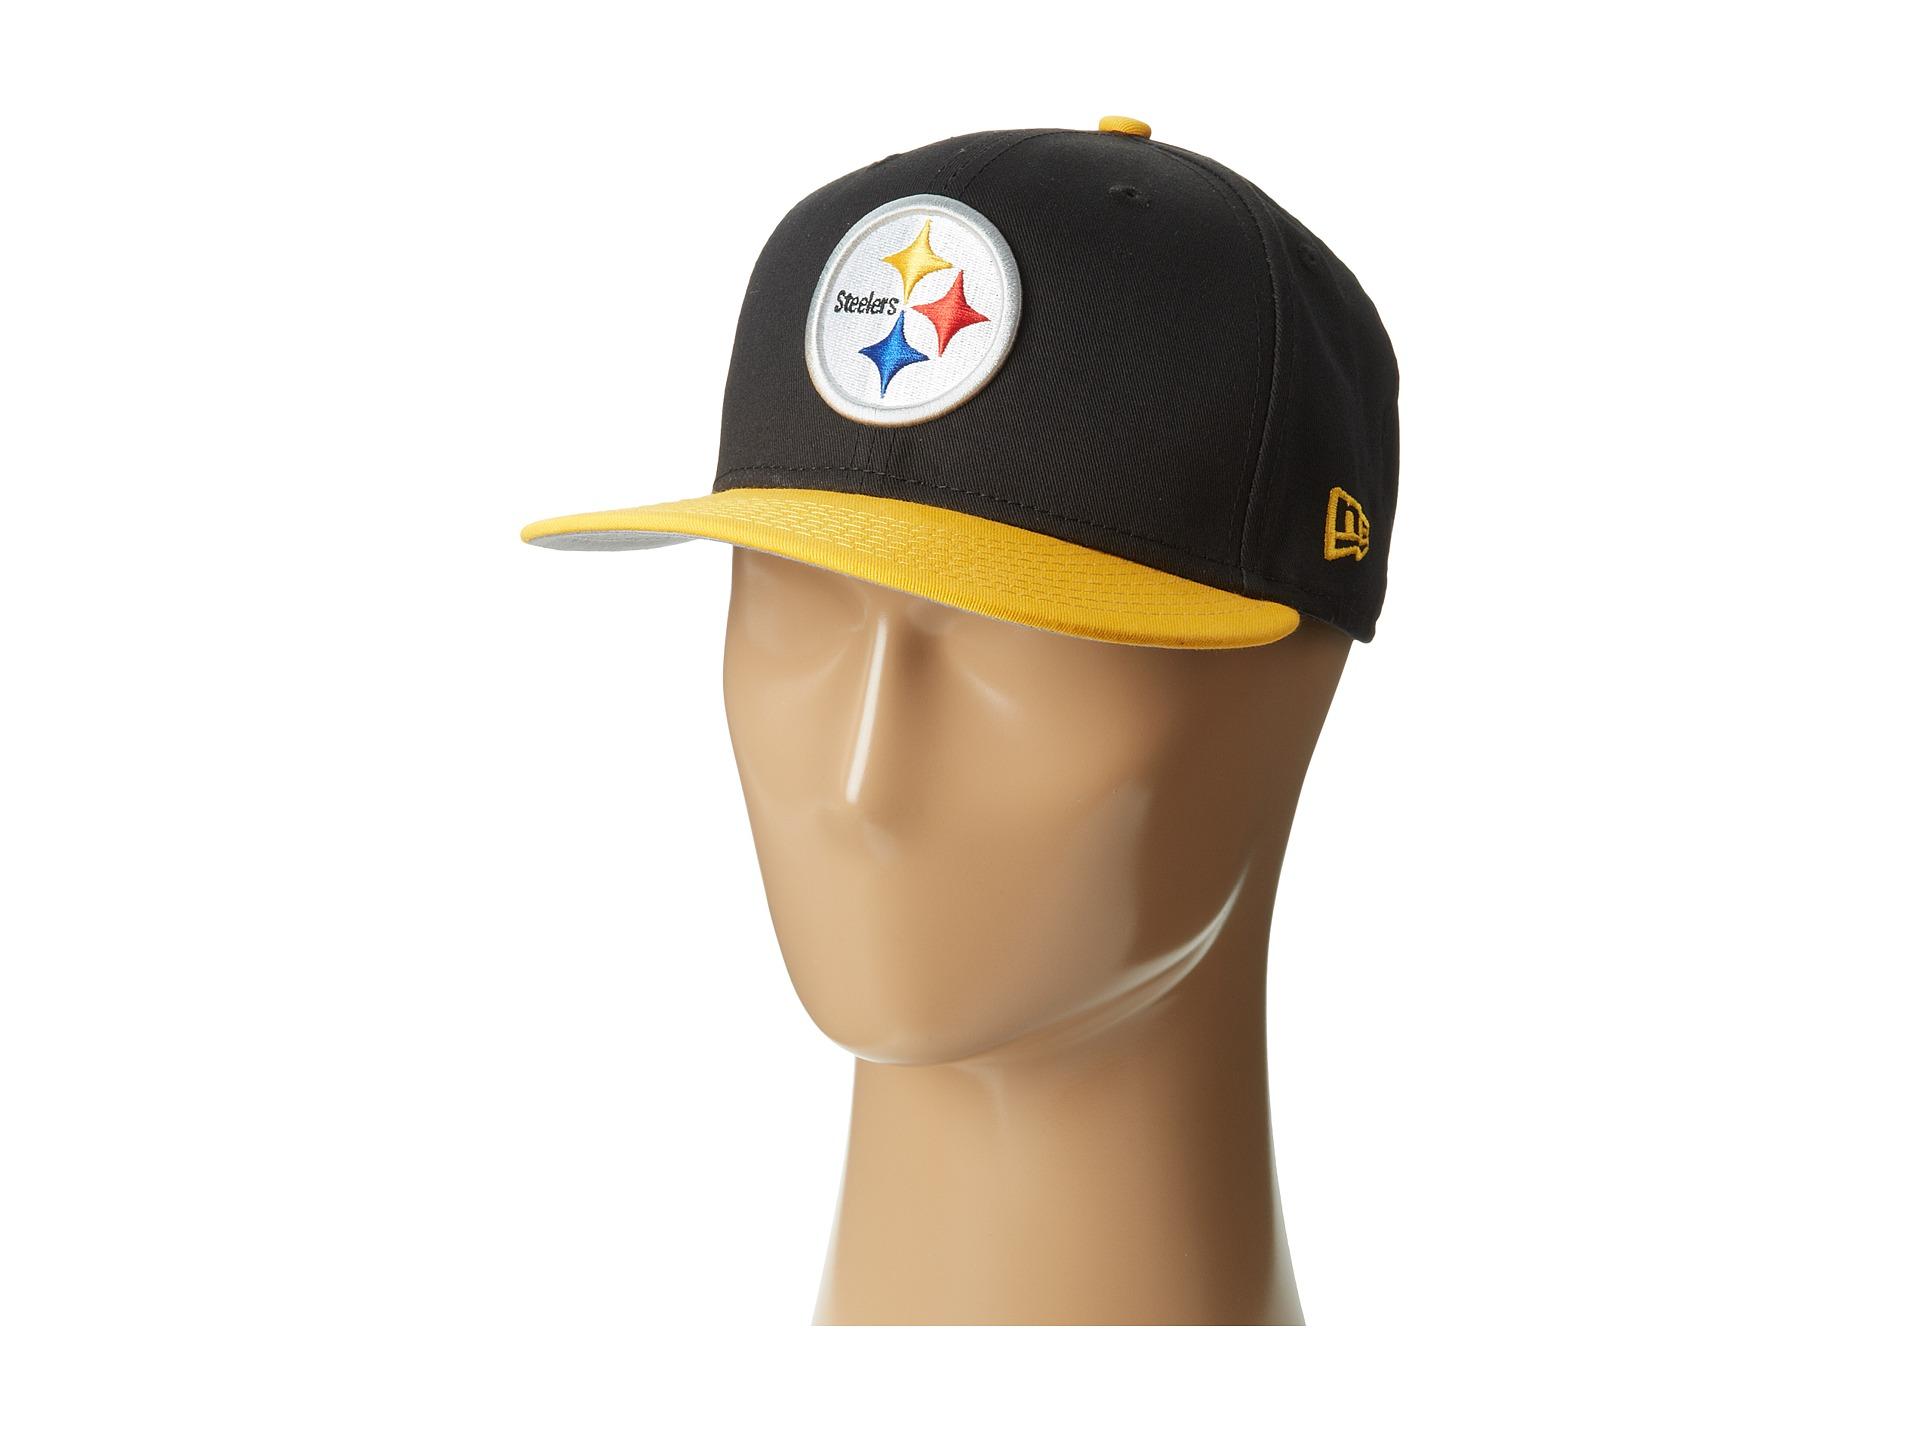 New Era Nfl Baycik Snap 59fifty Pittsburgh Steelers